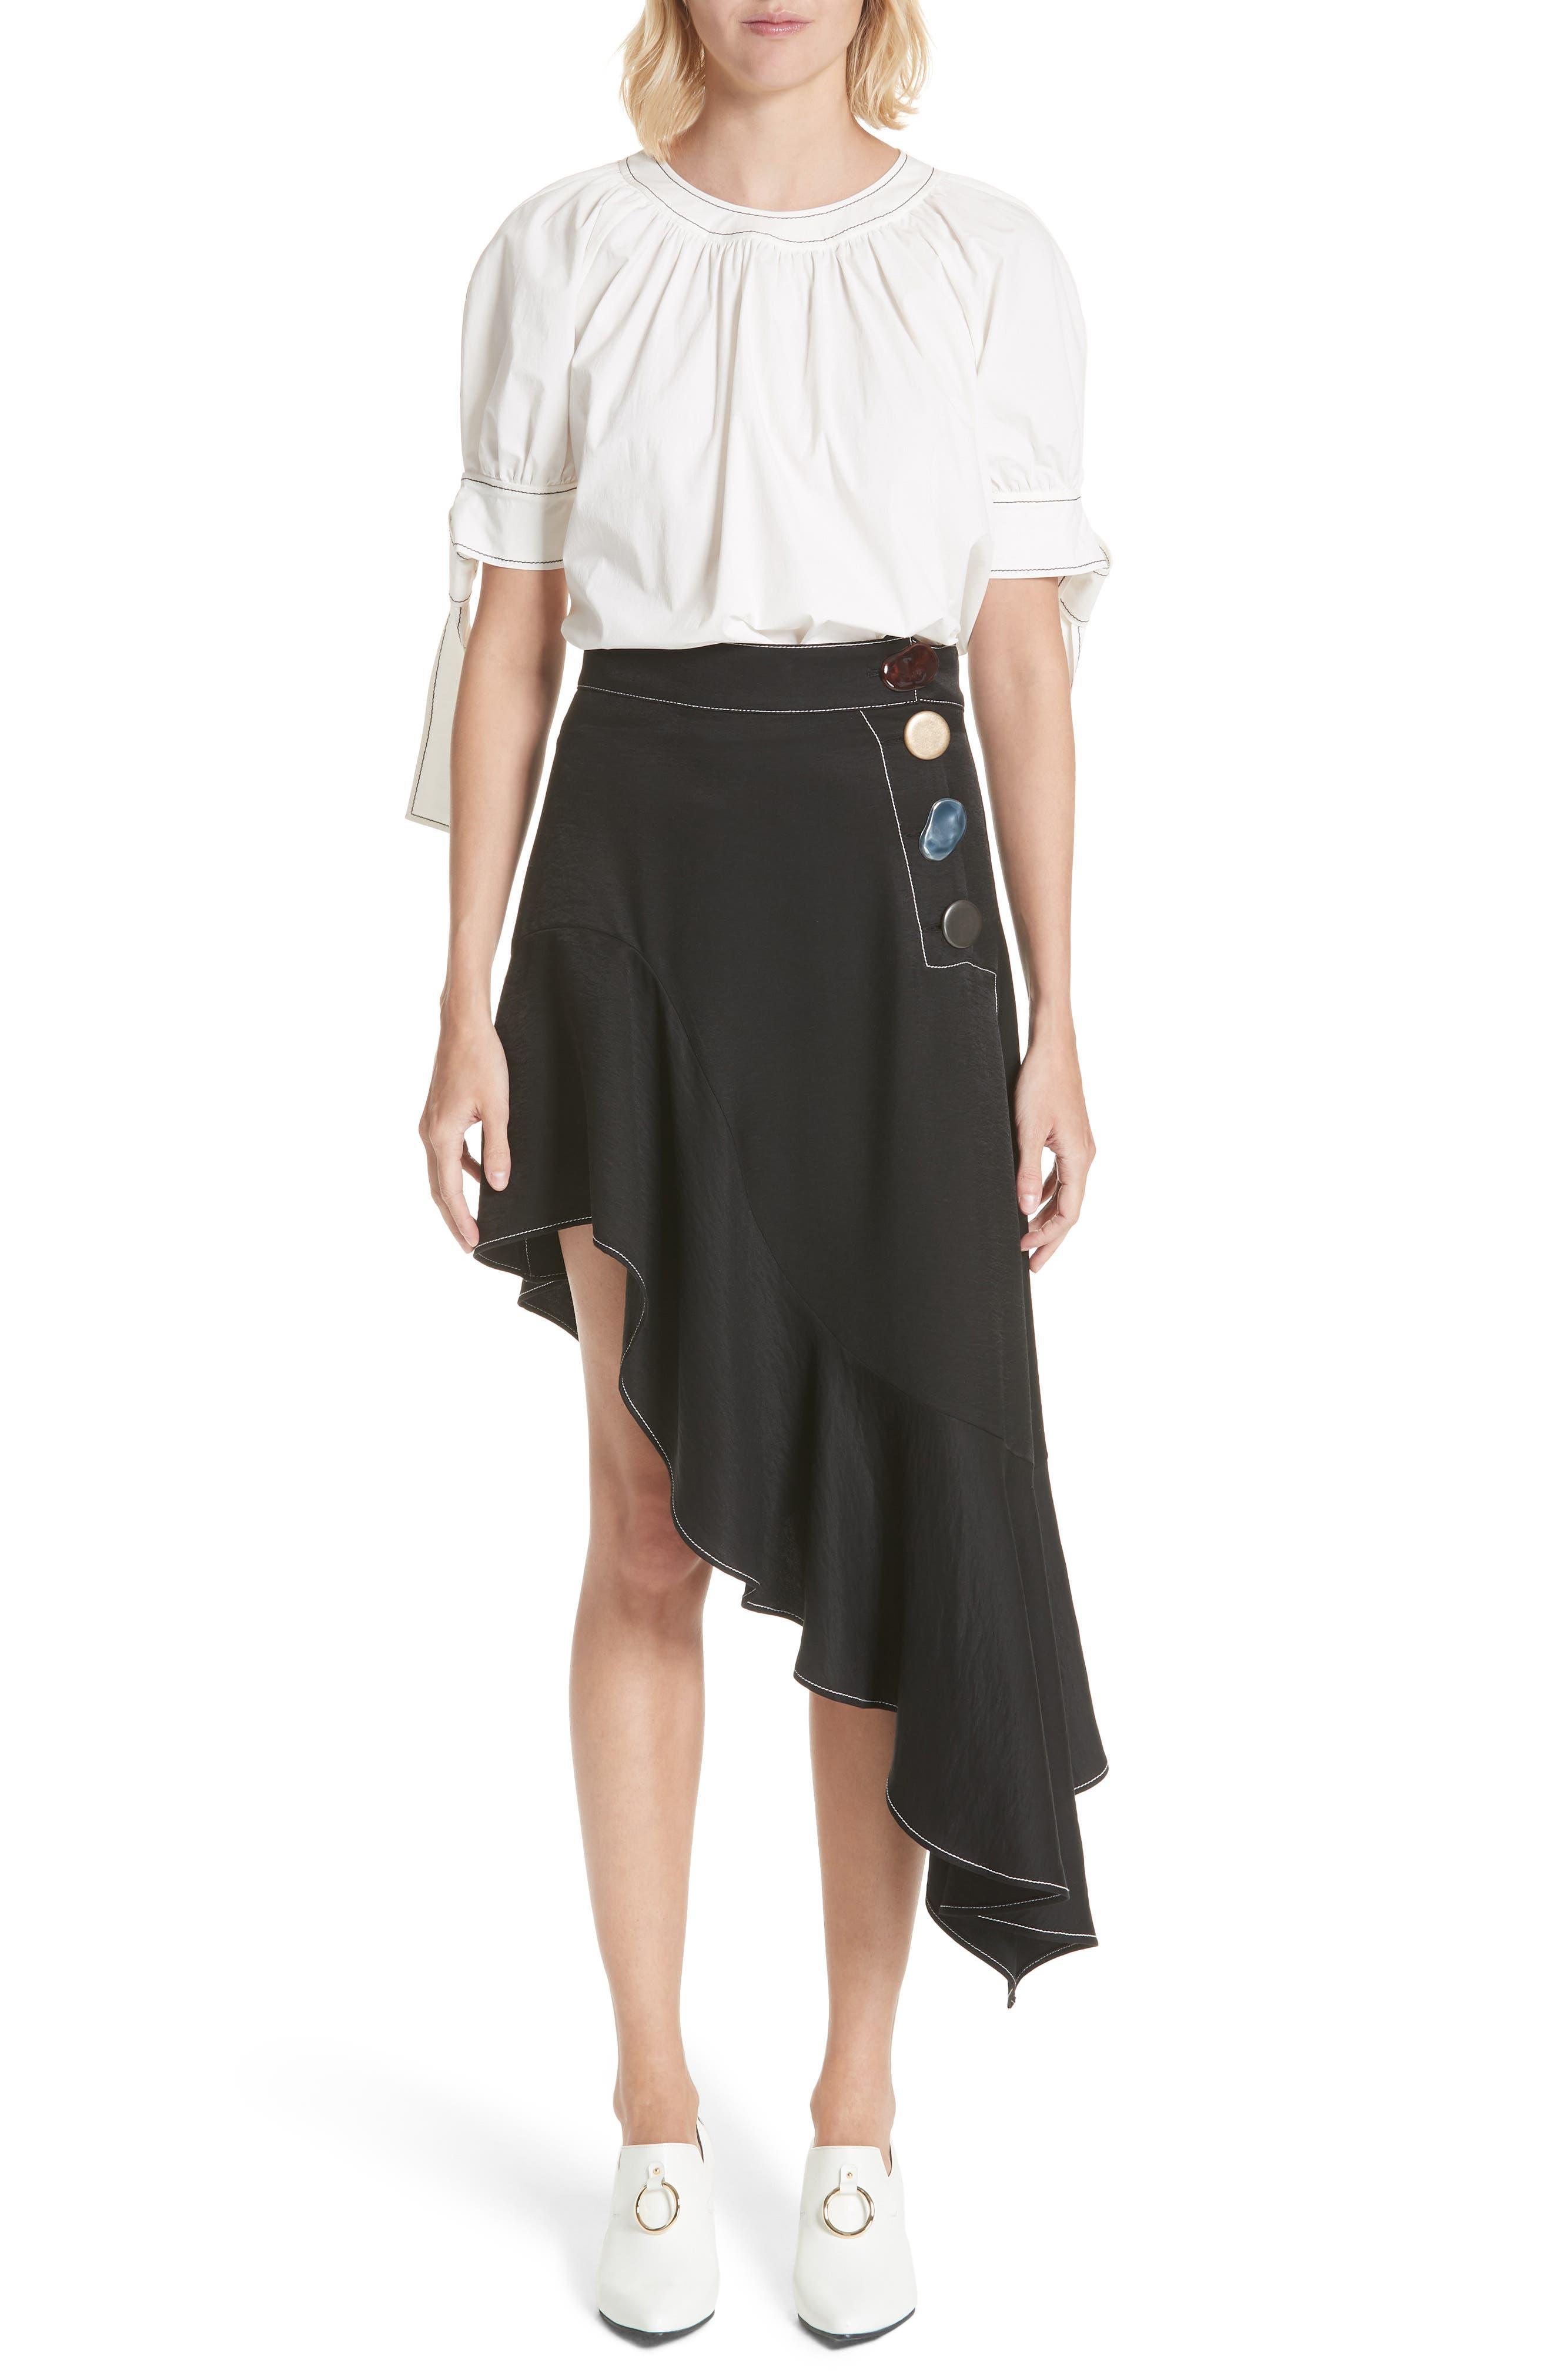 Hailey Short Sleeve Blouse Top,                             Alternate thumbnail 7, color,                             Cotton White